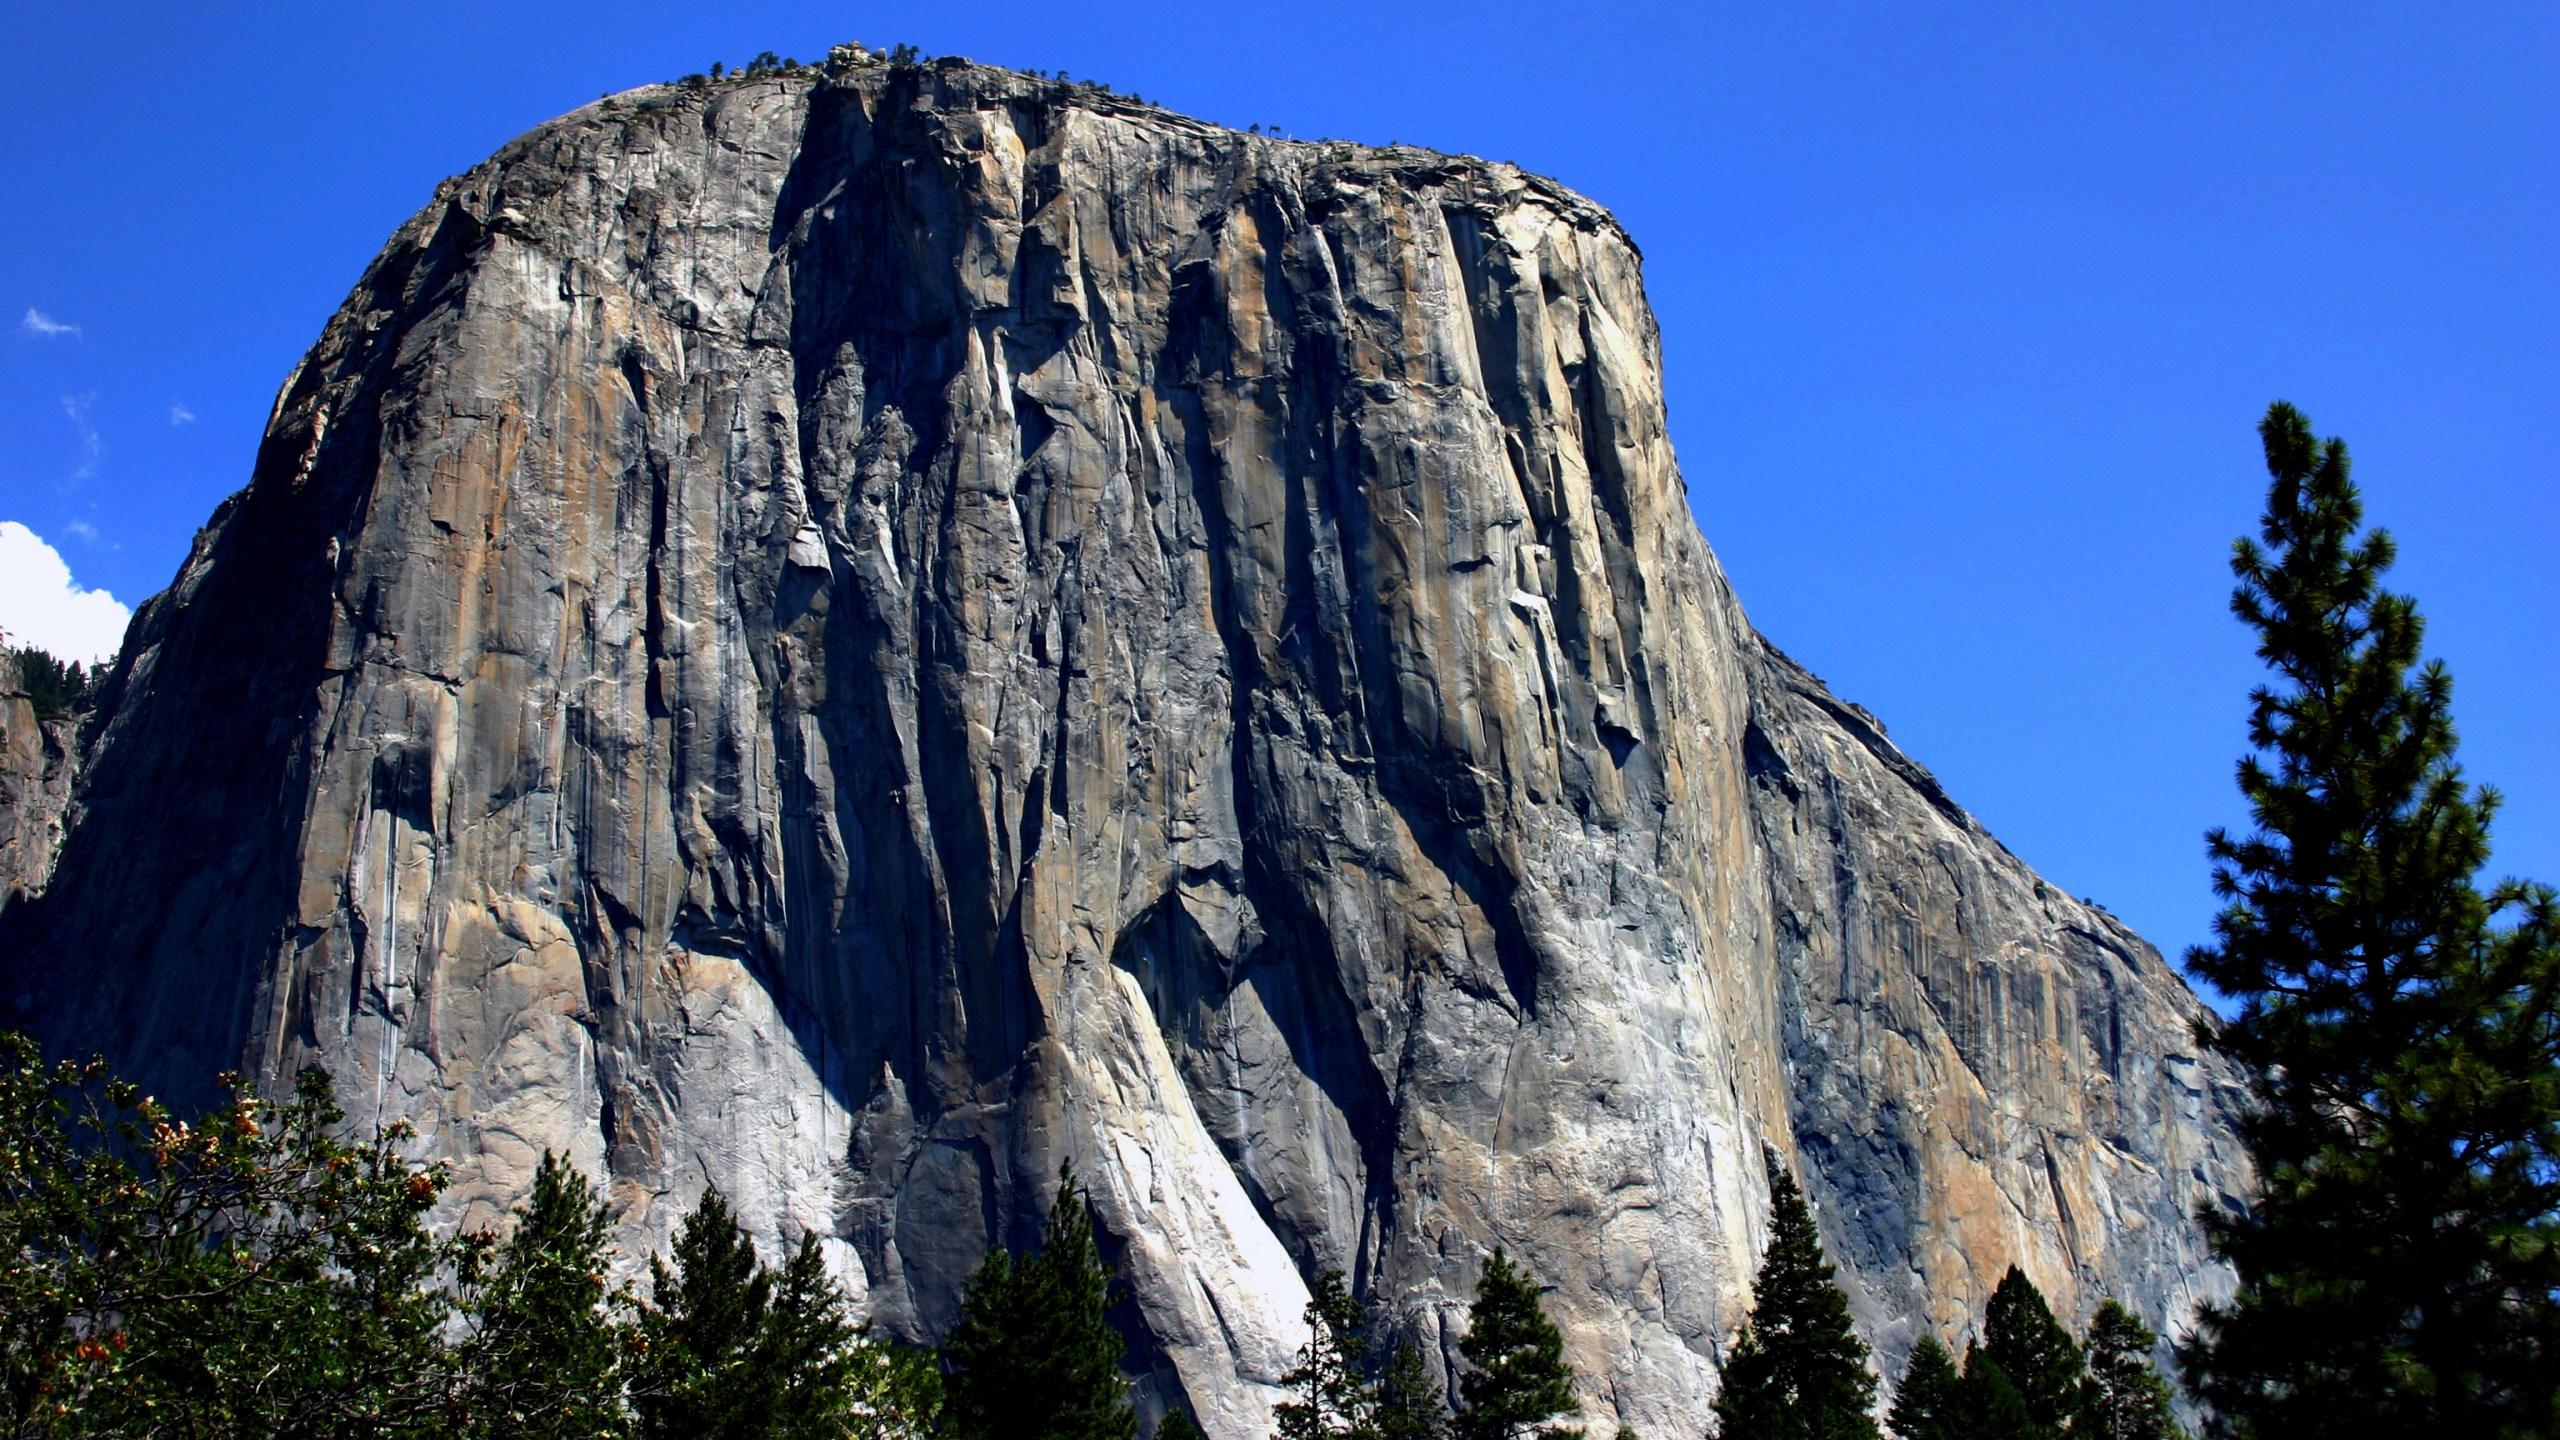 Yosemite_El_Capitan_1506562119870-159532.jpg29093066